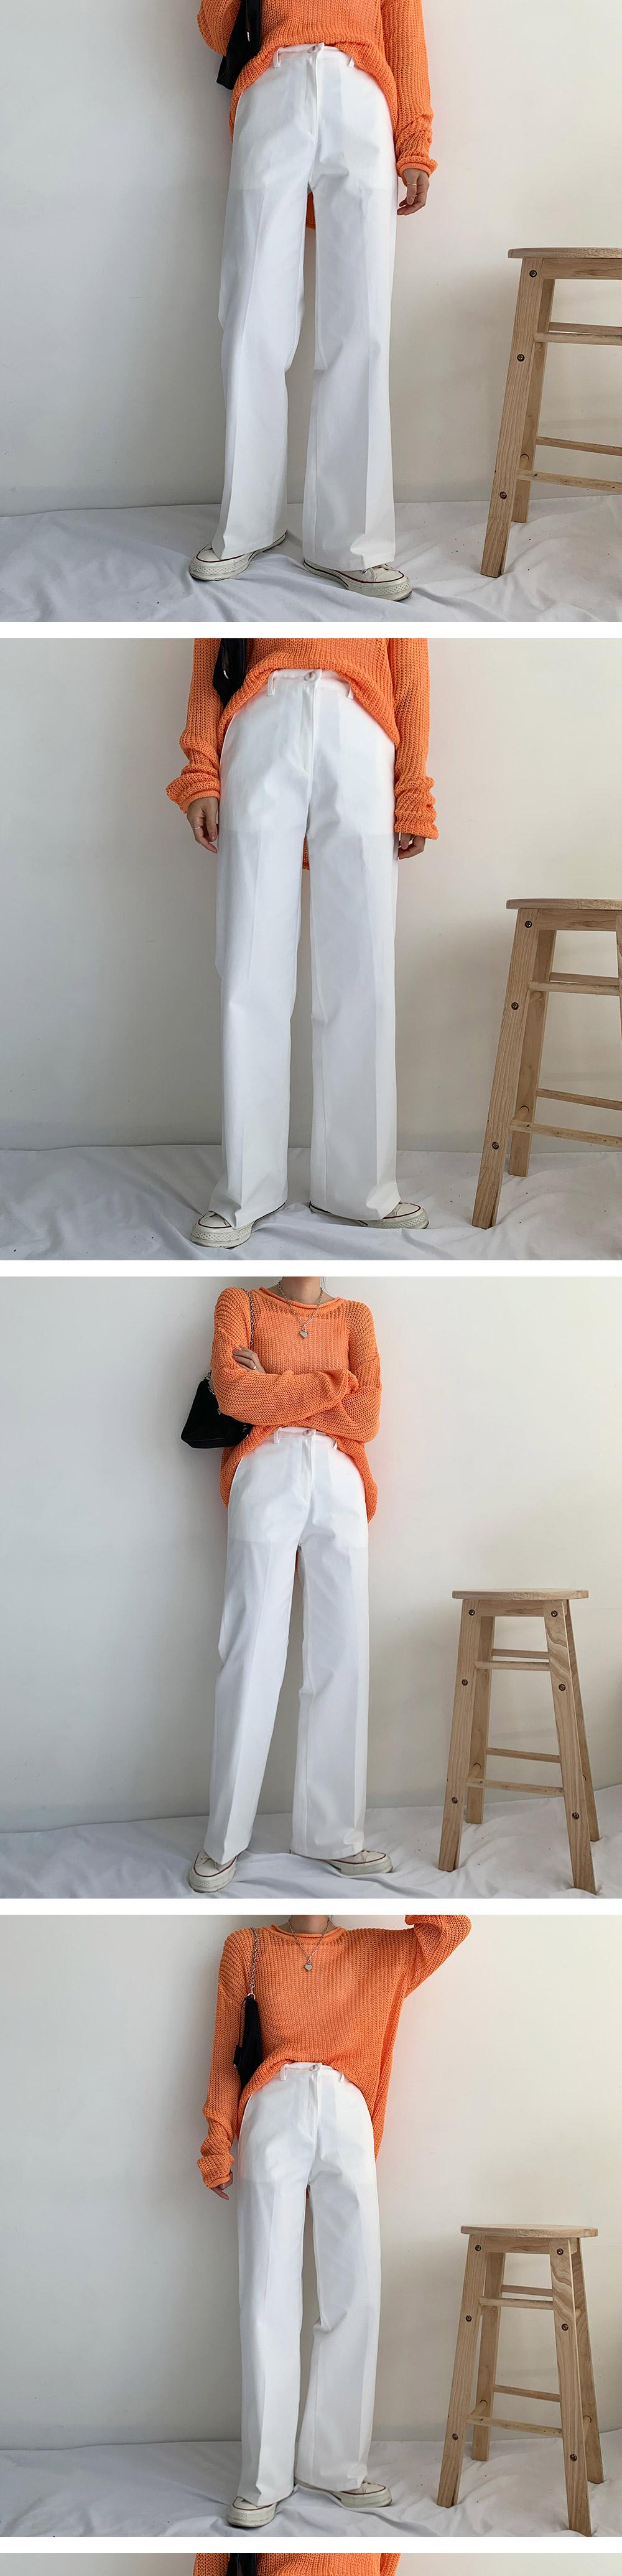 Pelcotton slim wide pants